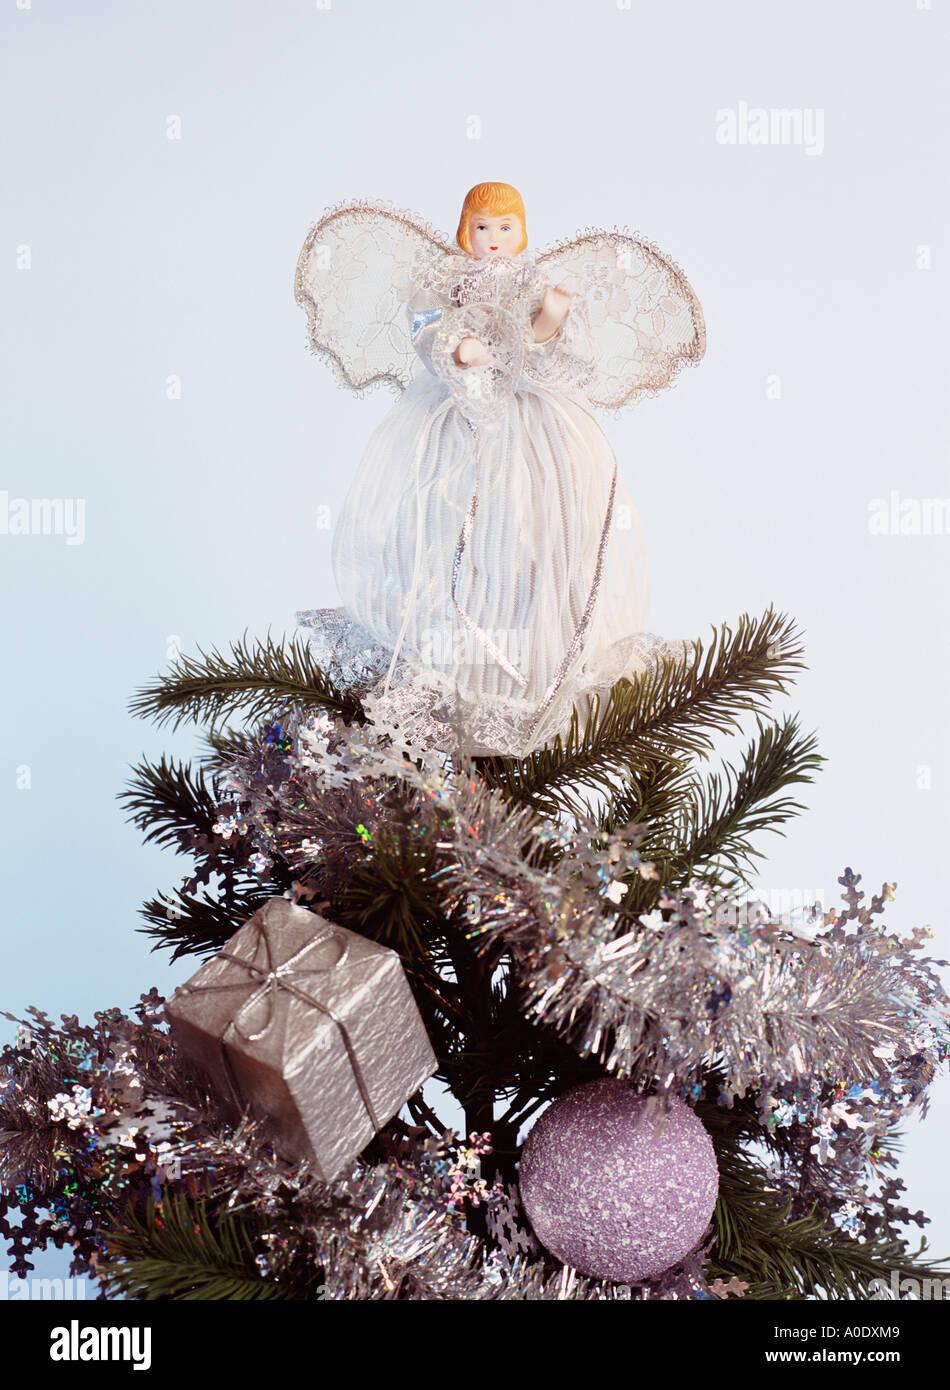 Superb Fairy On Christmas Tree Part - 9: Close Up Of A Fairy On Top Of A Christmas Tree